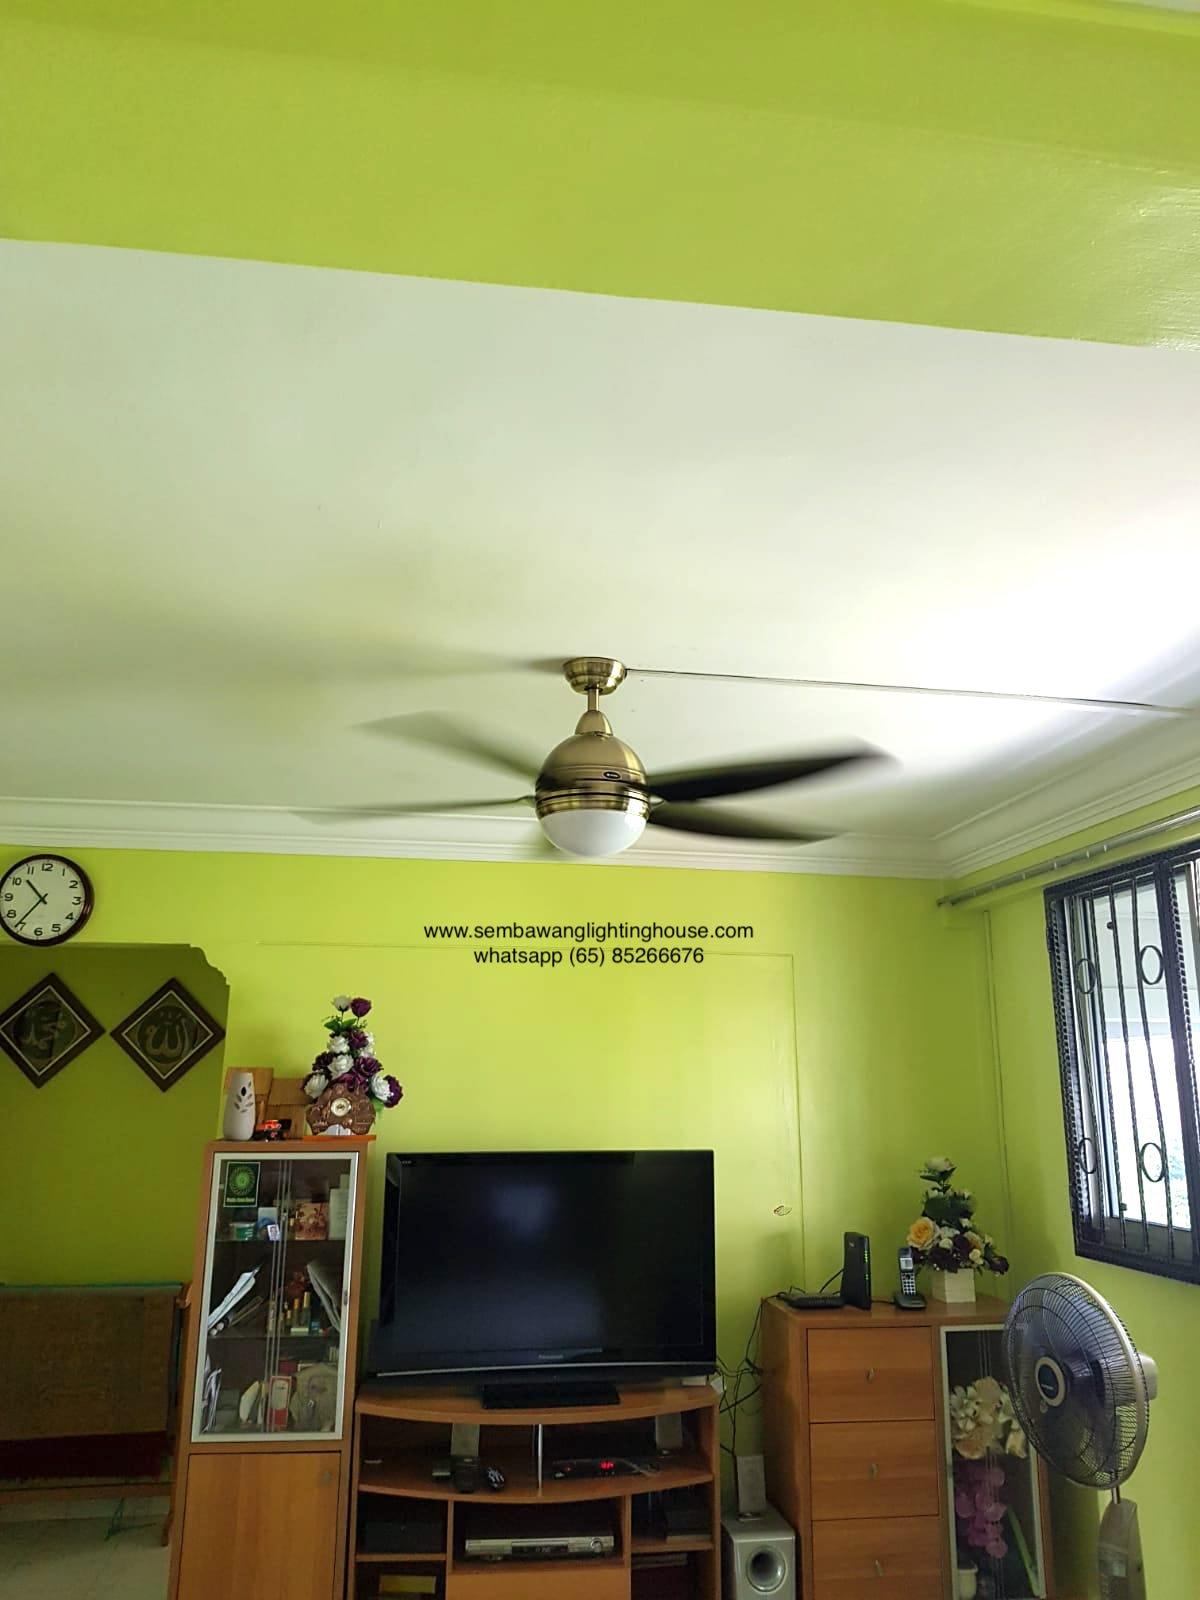 sample02-samaire-sa575-57-inch-brown-ceiling-fan-with-light-sembawang-lighting-house.jpg